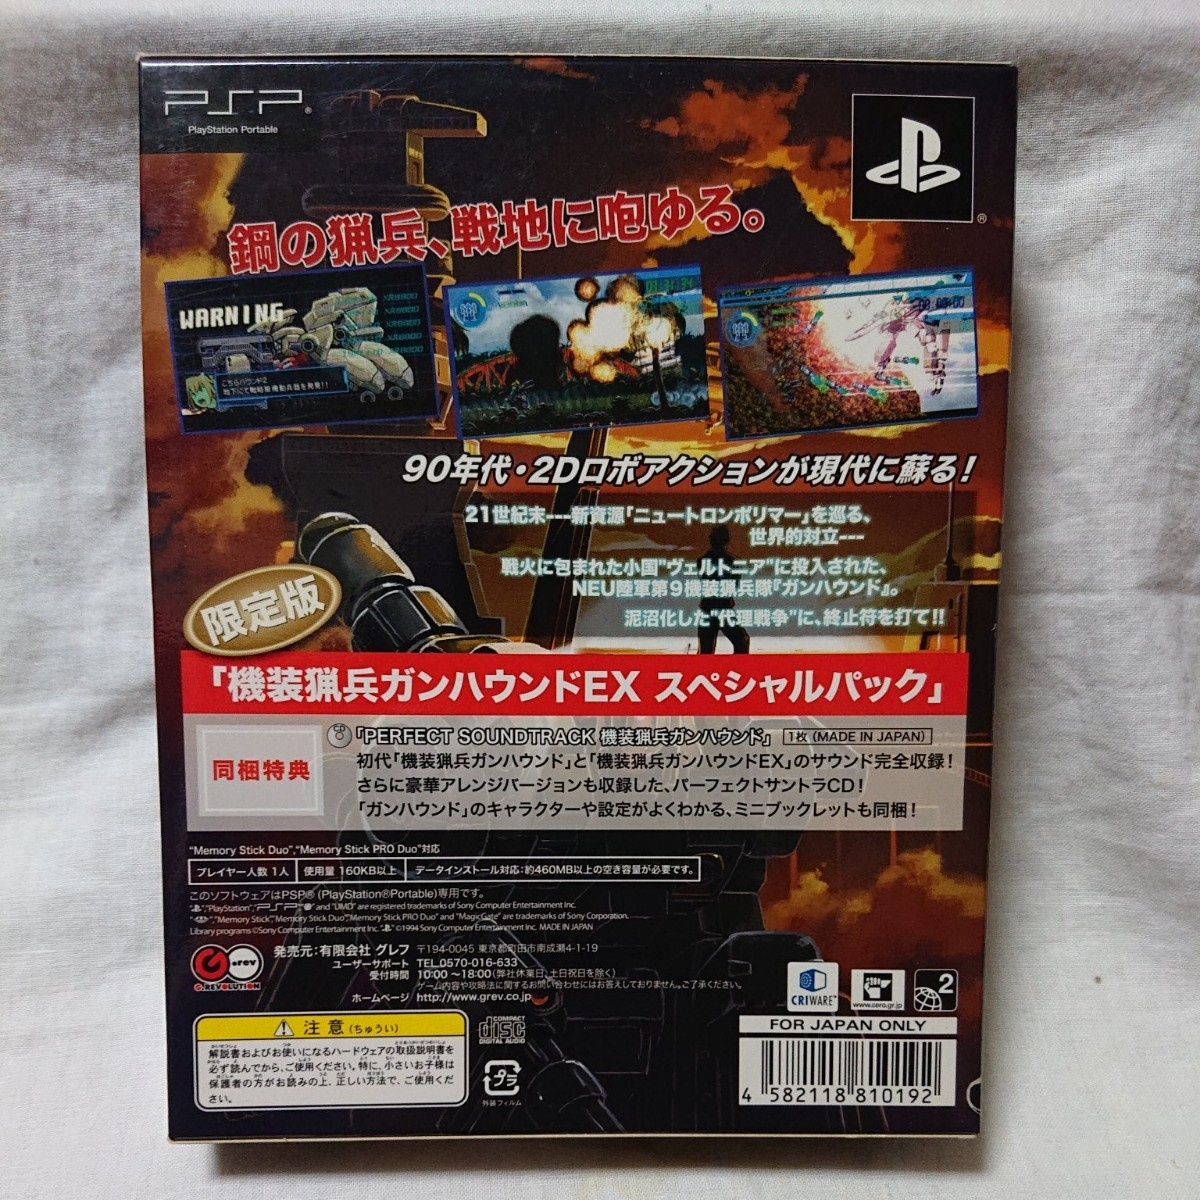 PSP 機装猟兵ガンハウンドEX 限定版 動作確認済み PSP